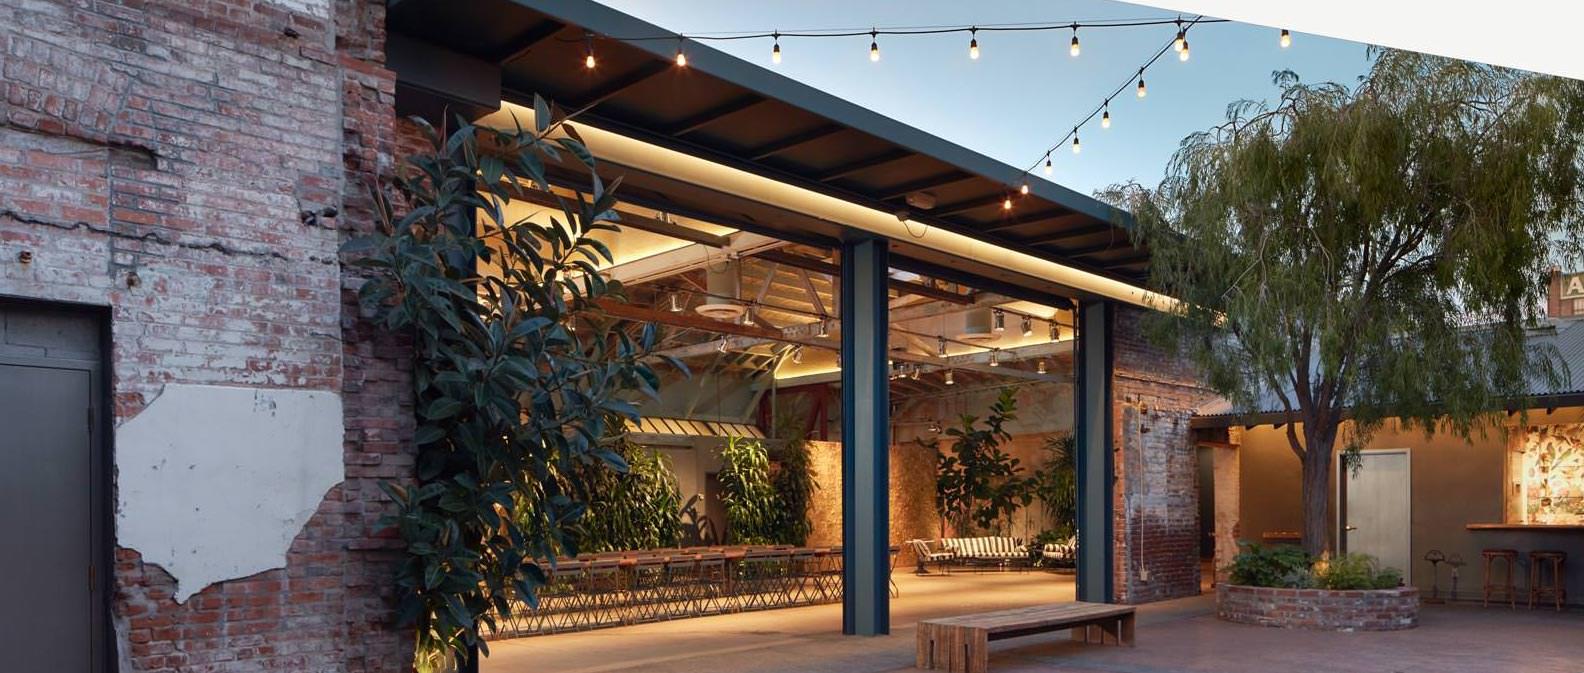 best california wedding venues hotel the millwick